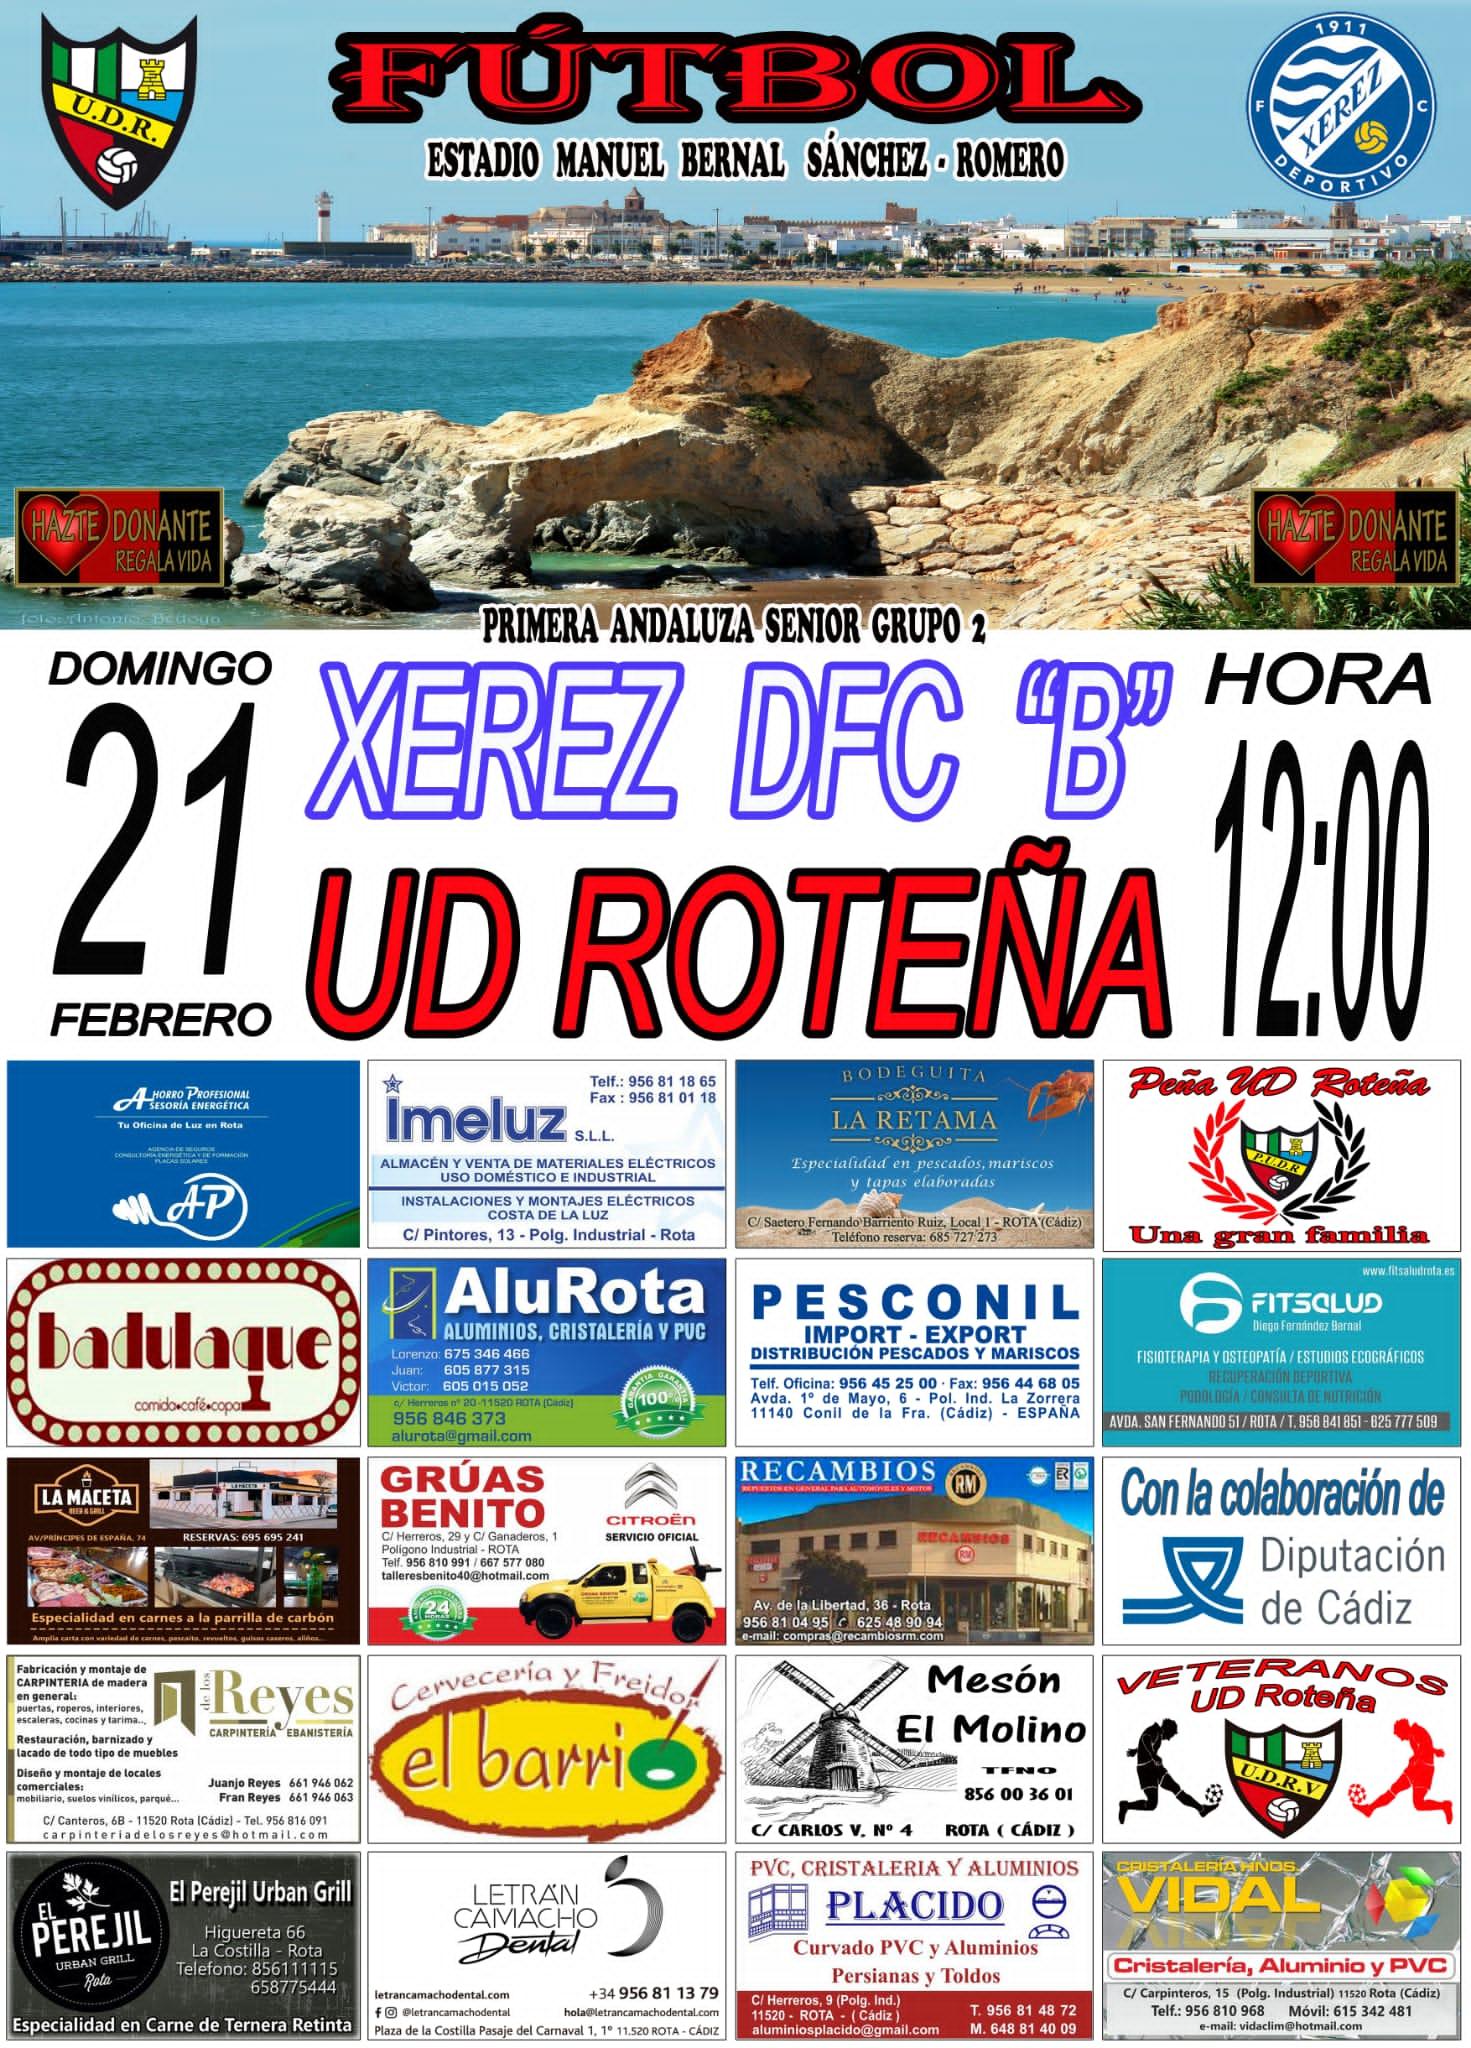 UD Roteña - Xerez DFC B